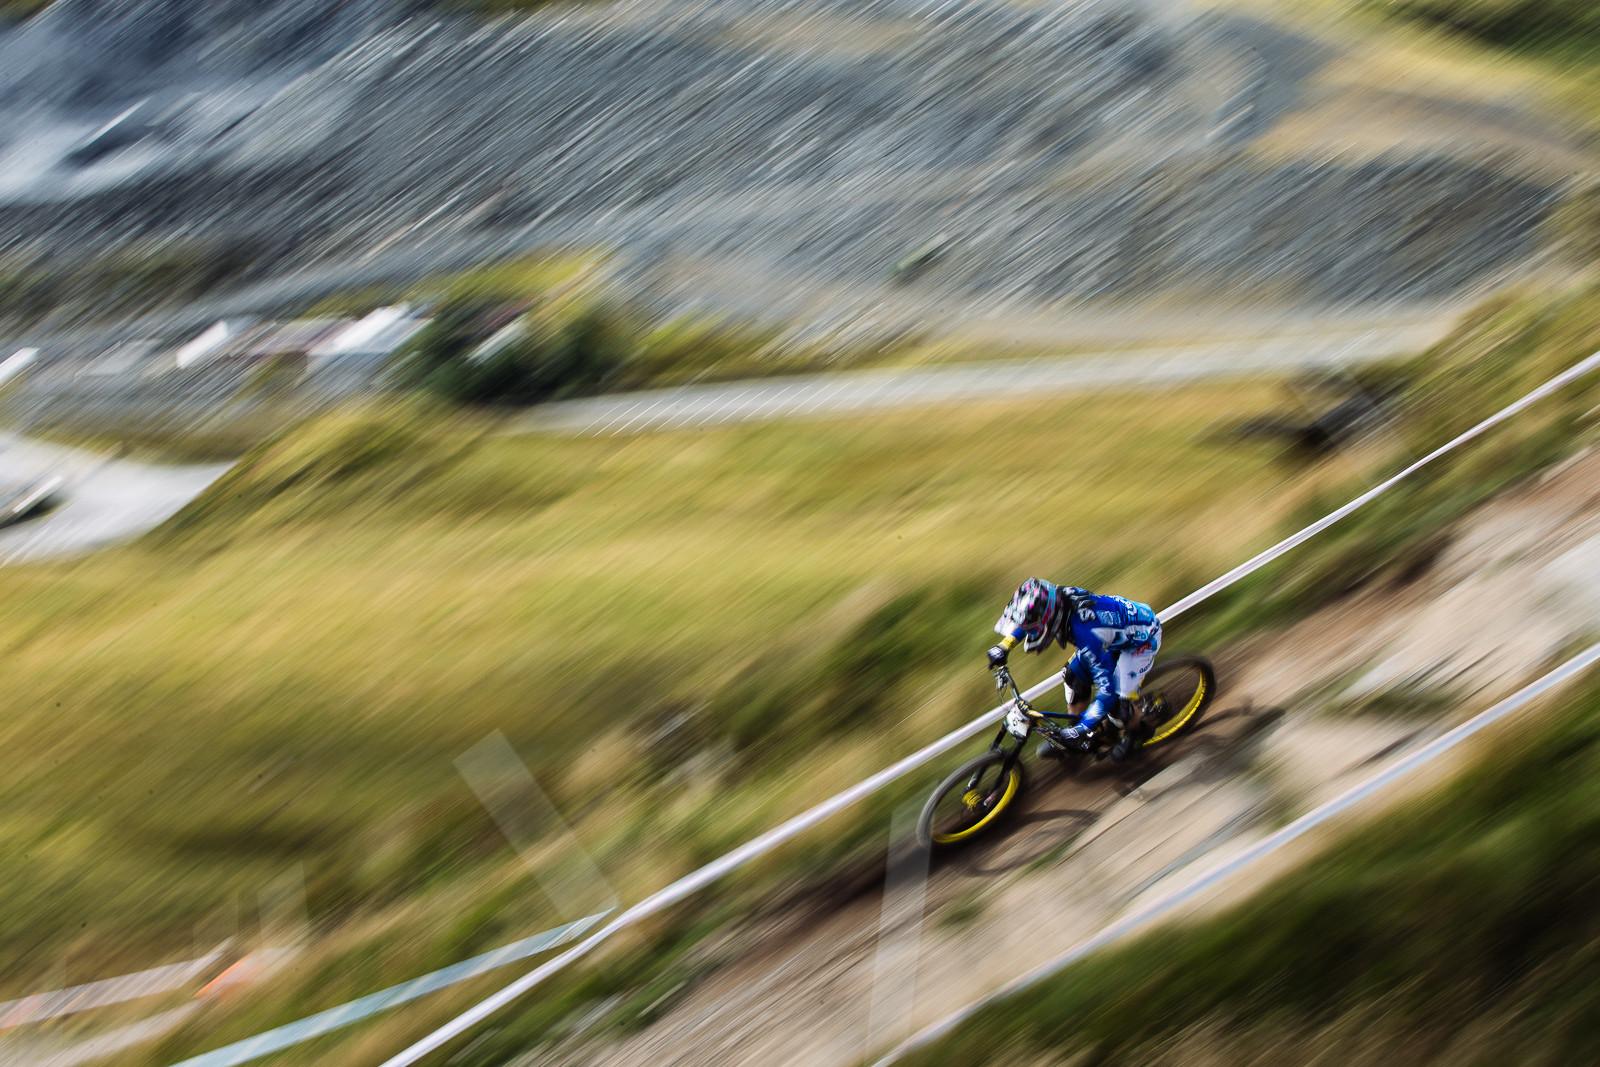 Joe Smith, 2015 British Downhill Series Winner - 2015 British Downhill Series Finals - Mountain Biking Pictures - Vital MTB